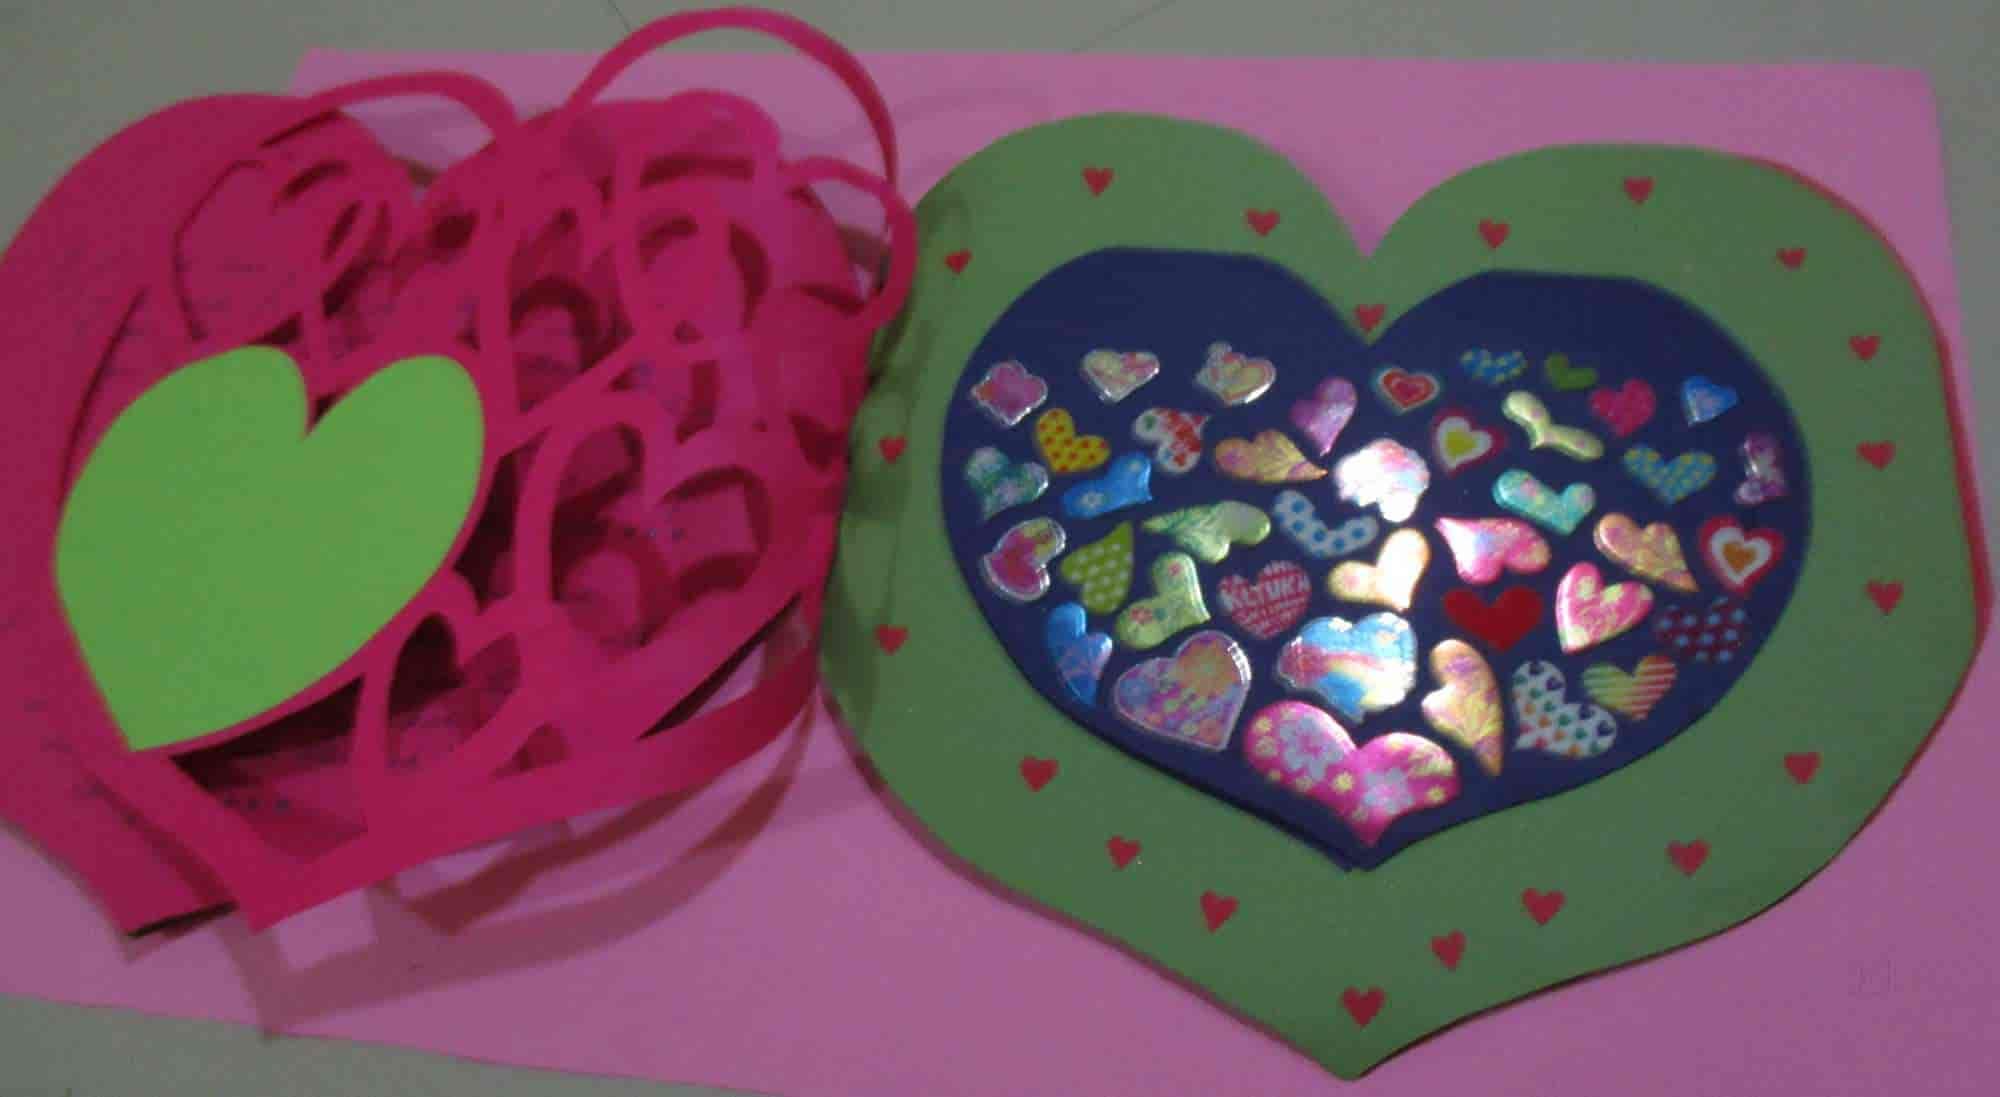 Minis designer greeting cards photos thergaon pune pictures greeting cards minis designer greeting cards photos thergaon pune greeting card dealers kristyandbryce Gallery